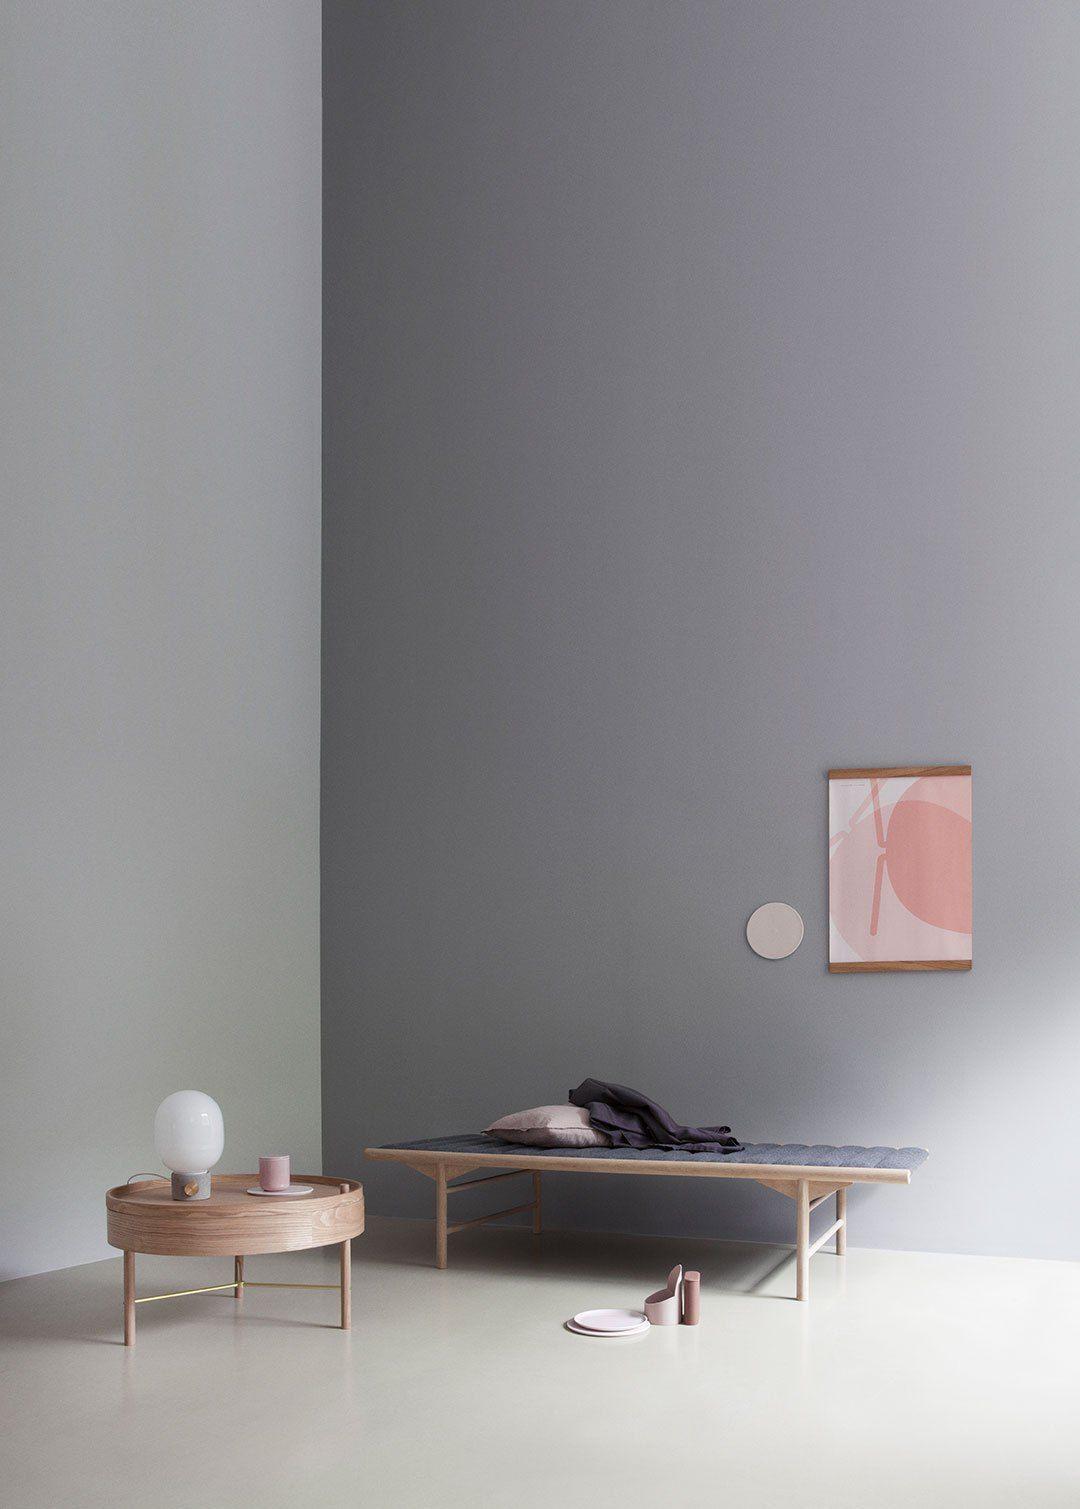 Menu Scandinavian Daybed Concrete Table Lamp Interior Furniture Jwda Lamp